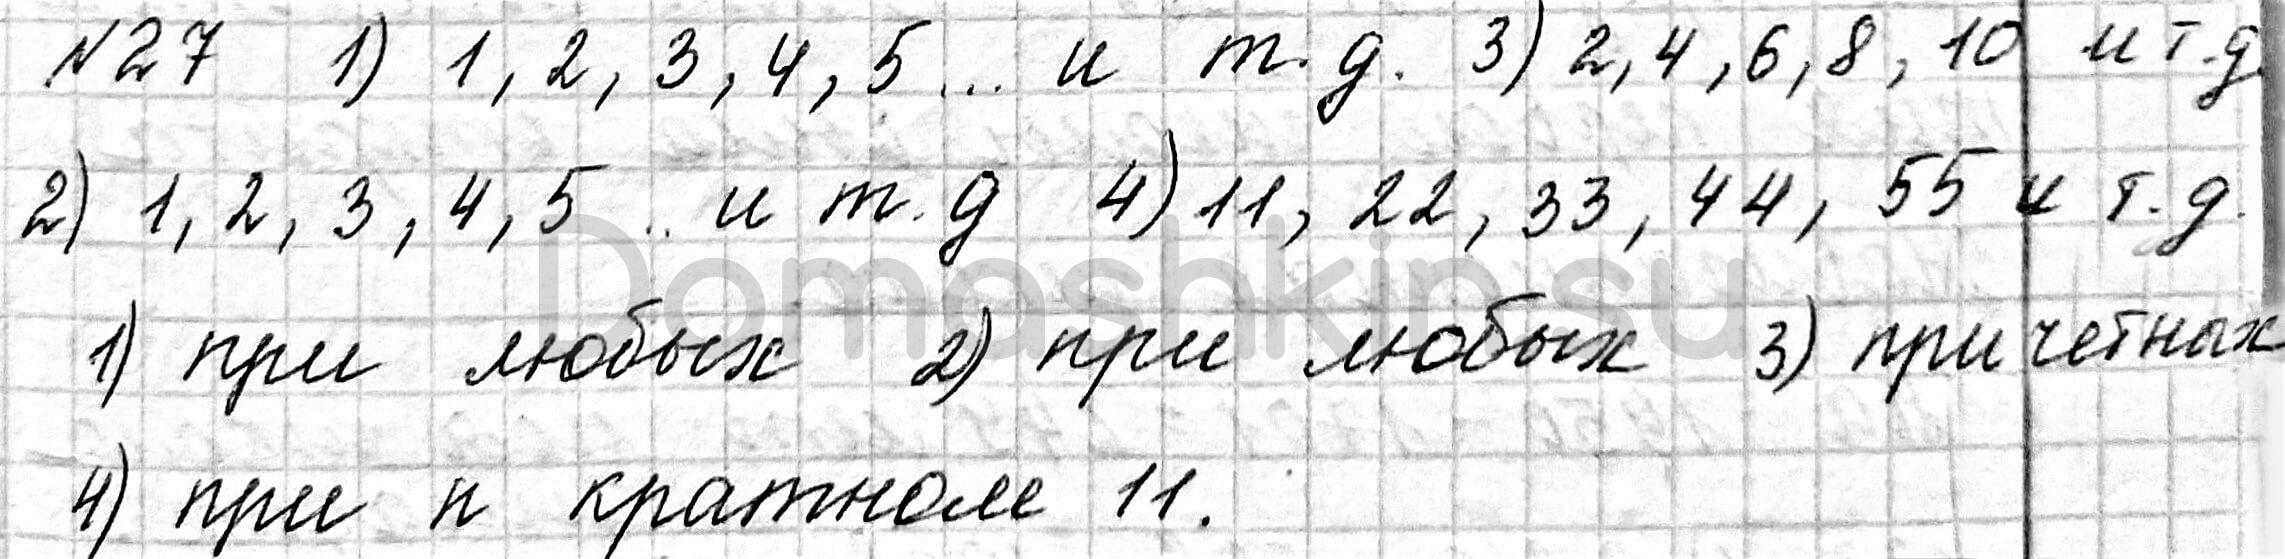 Математика 6 класс учебник Мерзляк номер 27 решение